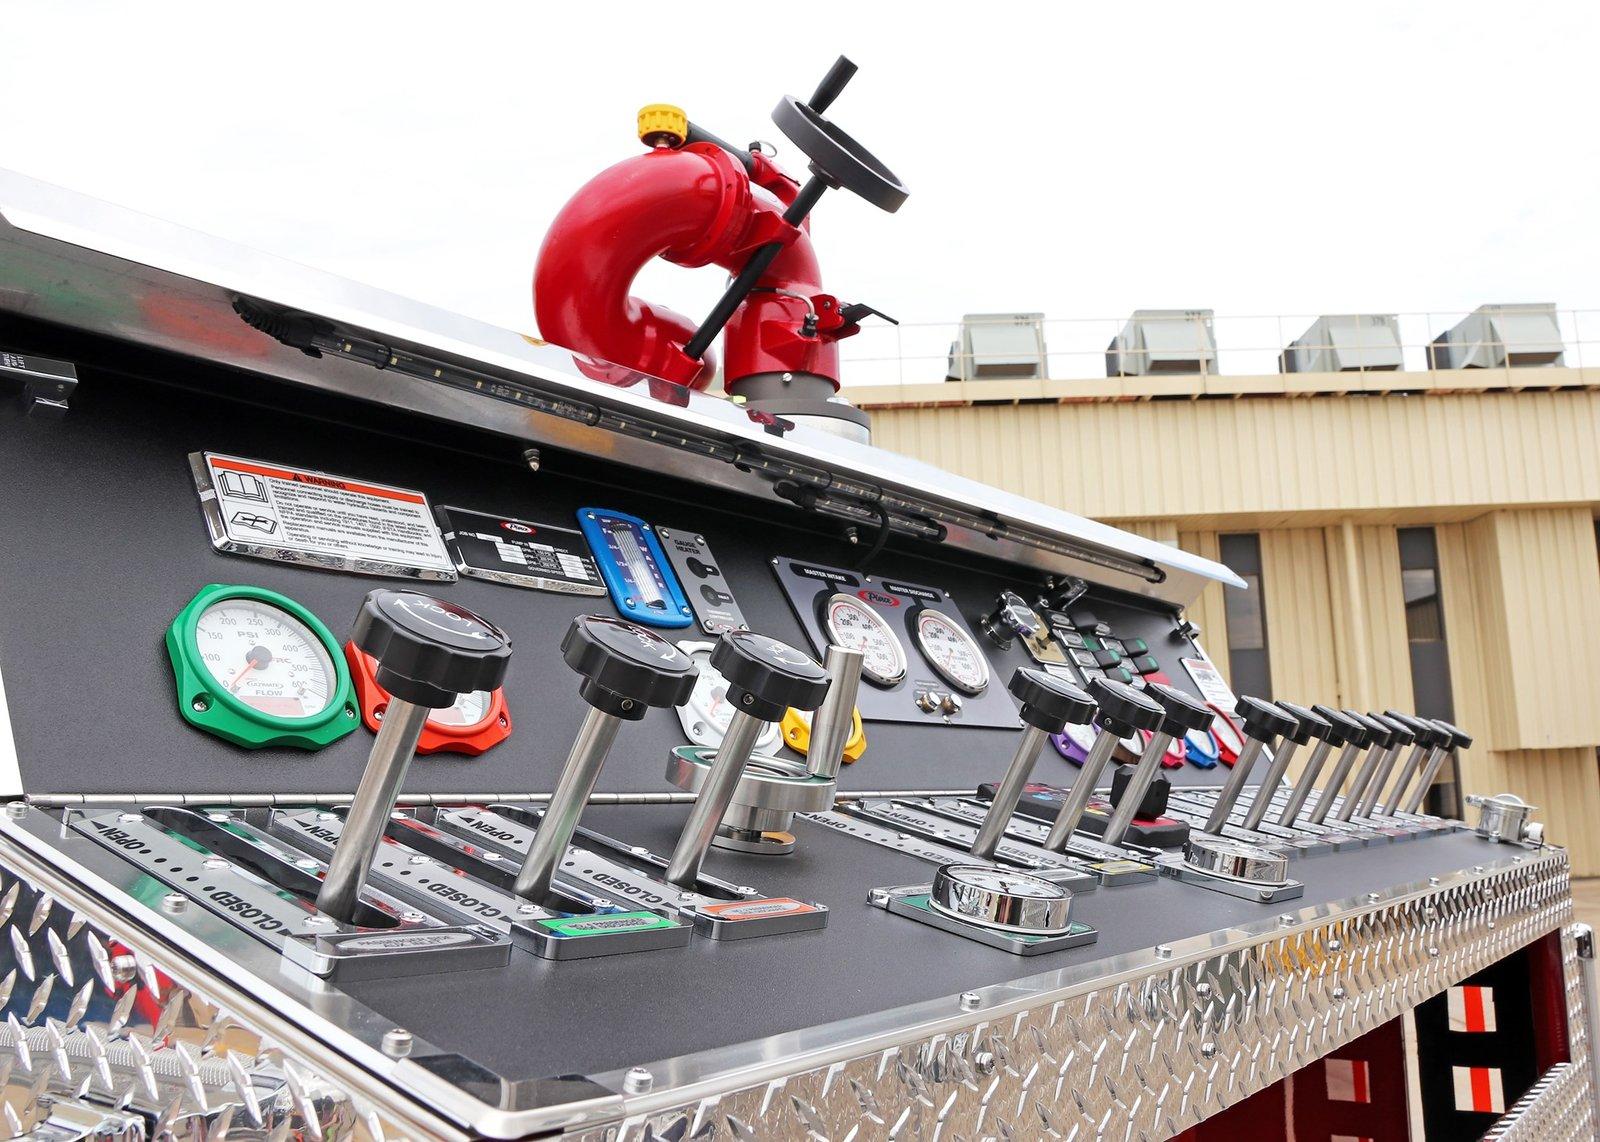 EM_ralston-volunteer-fire-department-pumper-34459